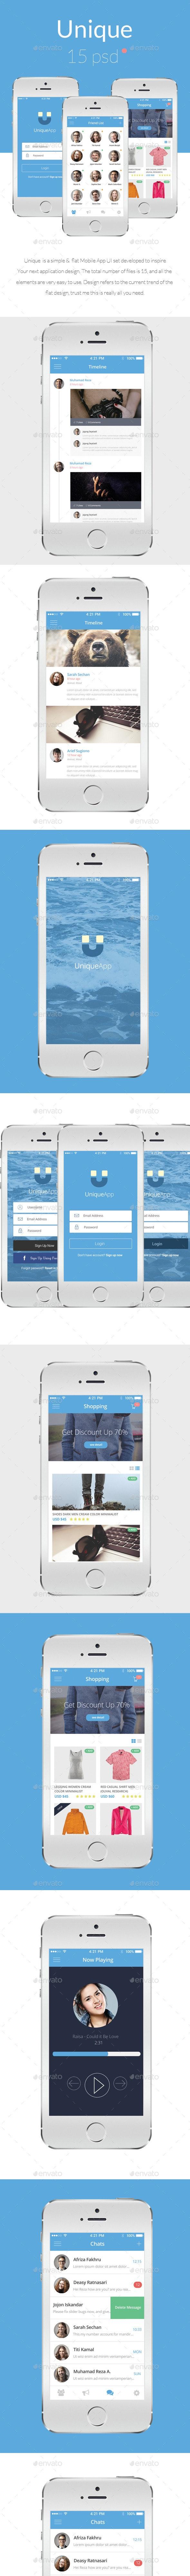 UniqueApp - Flat Mobile App UI Design - User Interfaces Web Elements